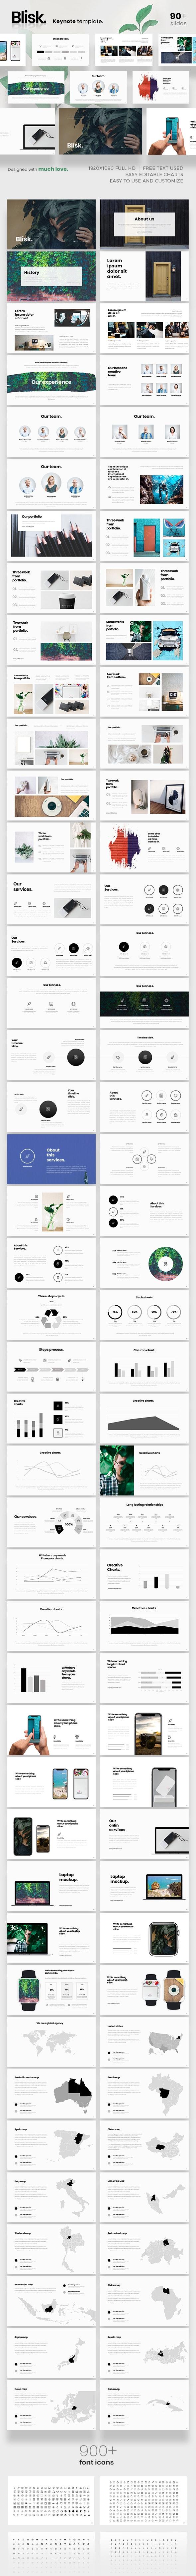 Blisk Keynote Presentation Template - Keynote Templates Presentation Templates